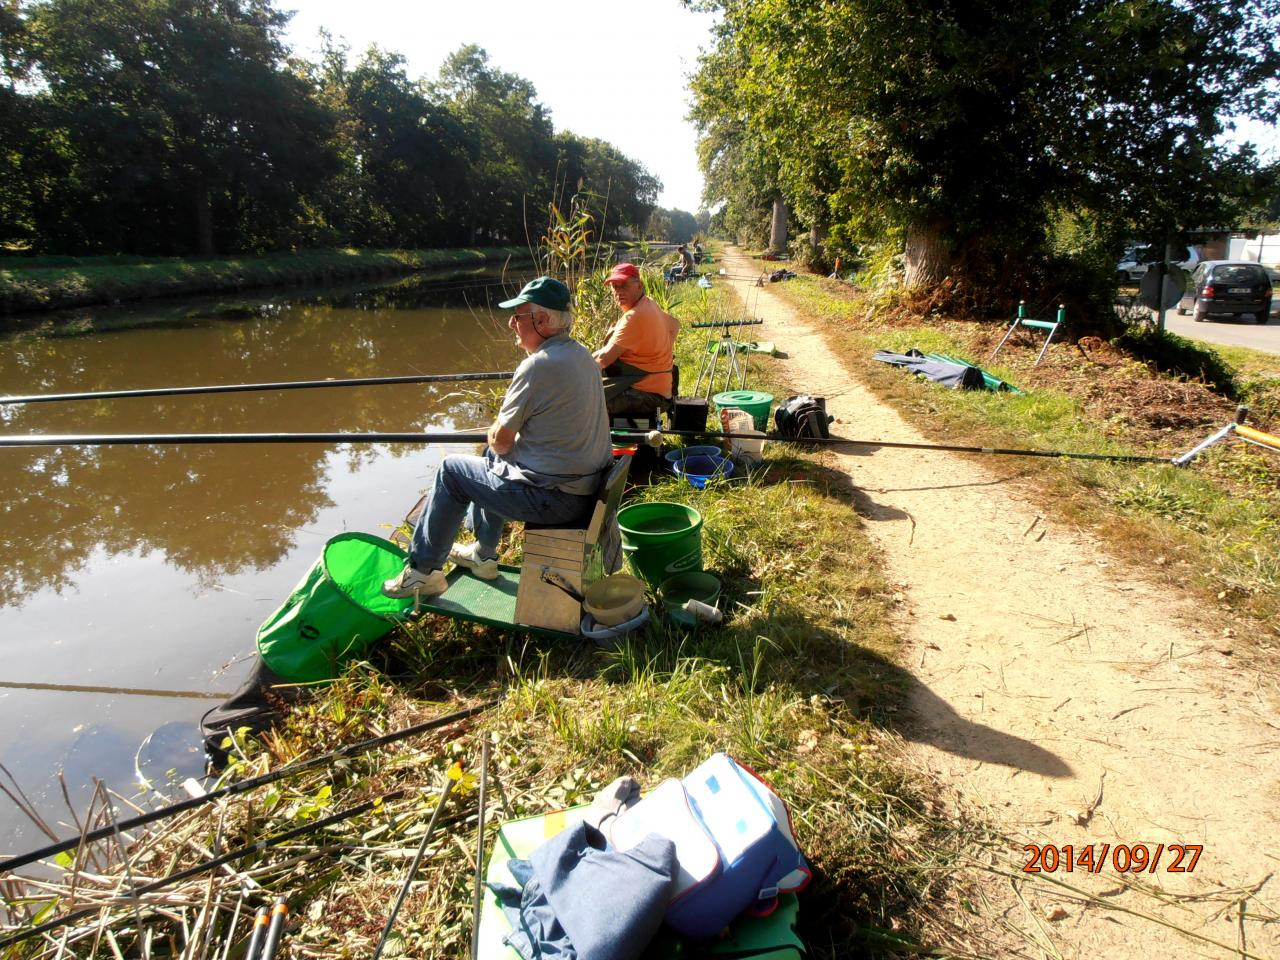 Marathon de Pêche 2014